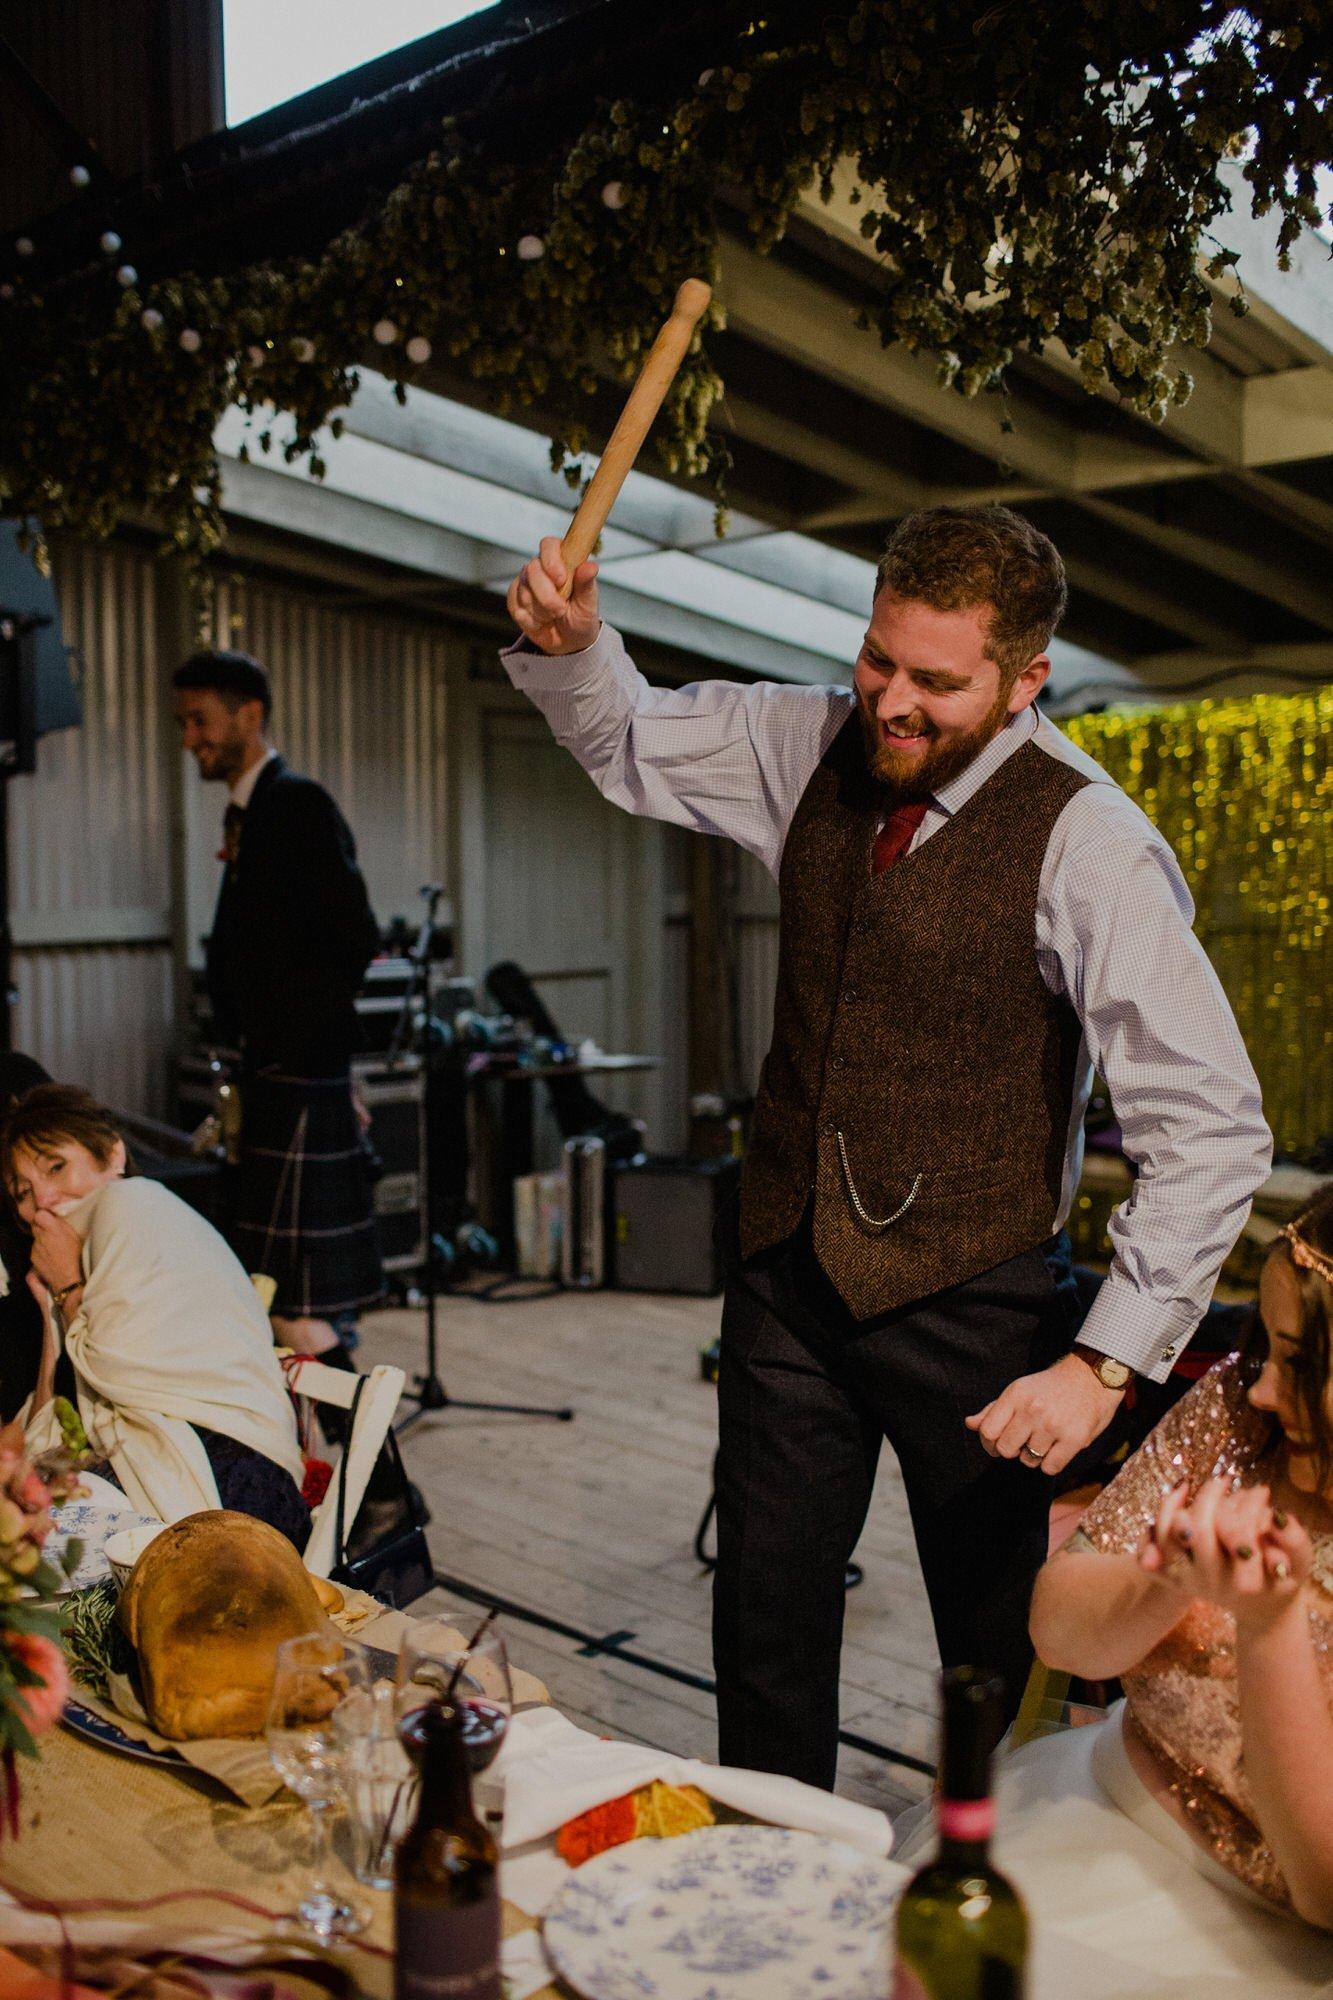 073 TIN SHED KNOCKRAICH FARM WEDDING ALTERNATIVE BRIDE ZOE ALEXANDRA PHOTOGRAPHY